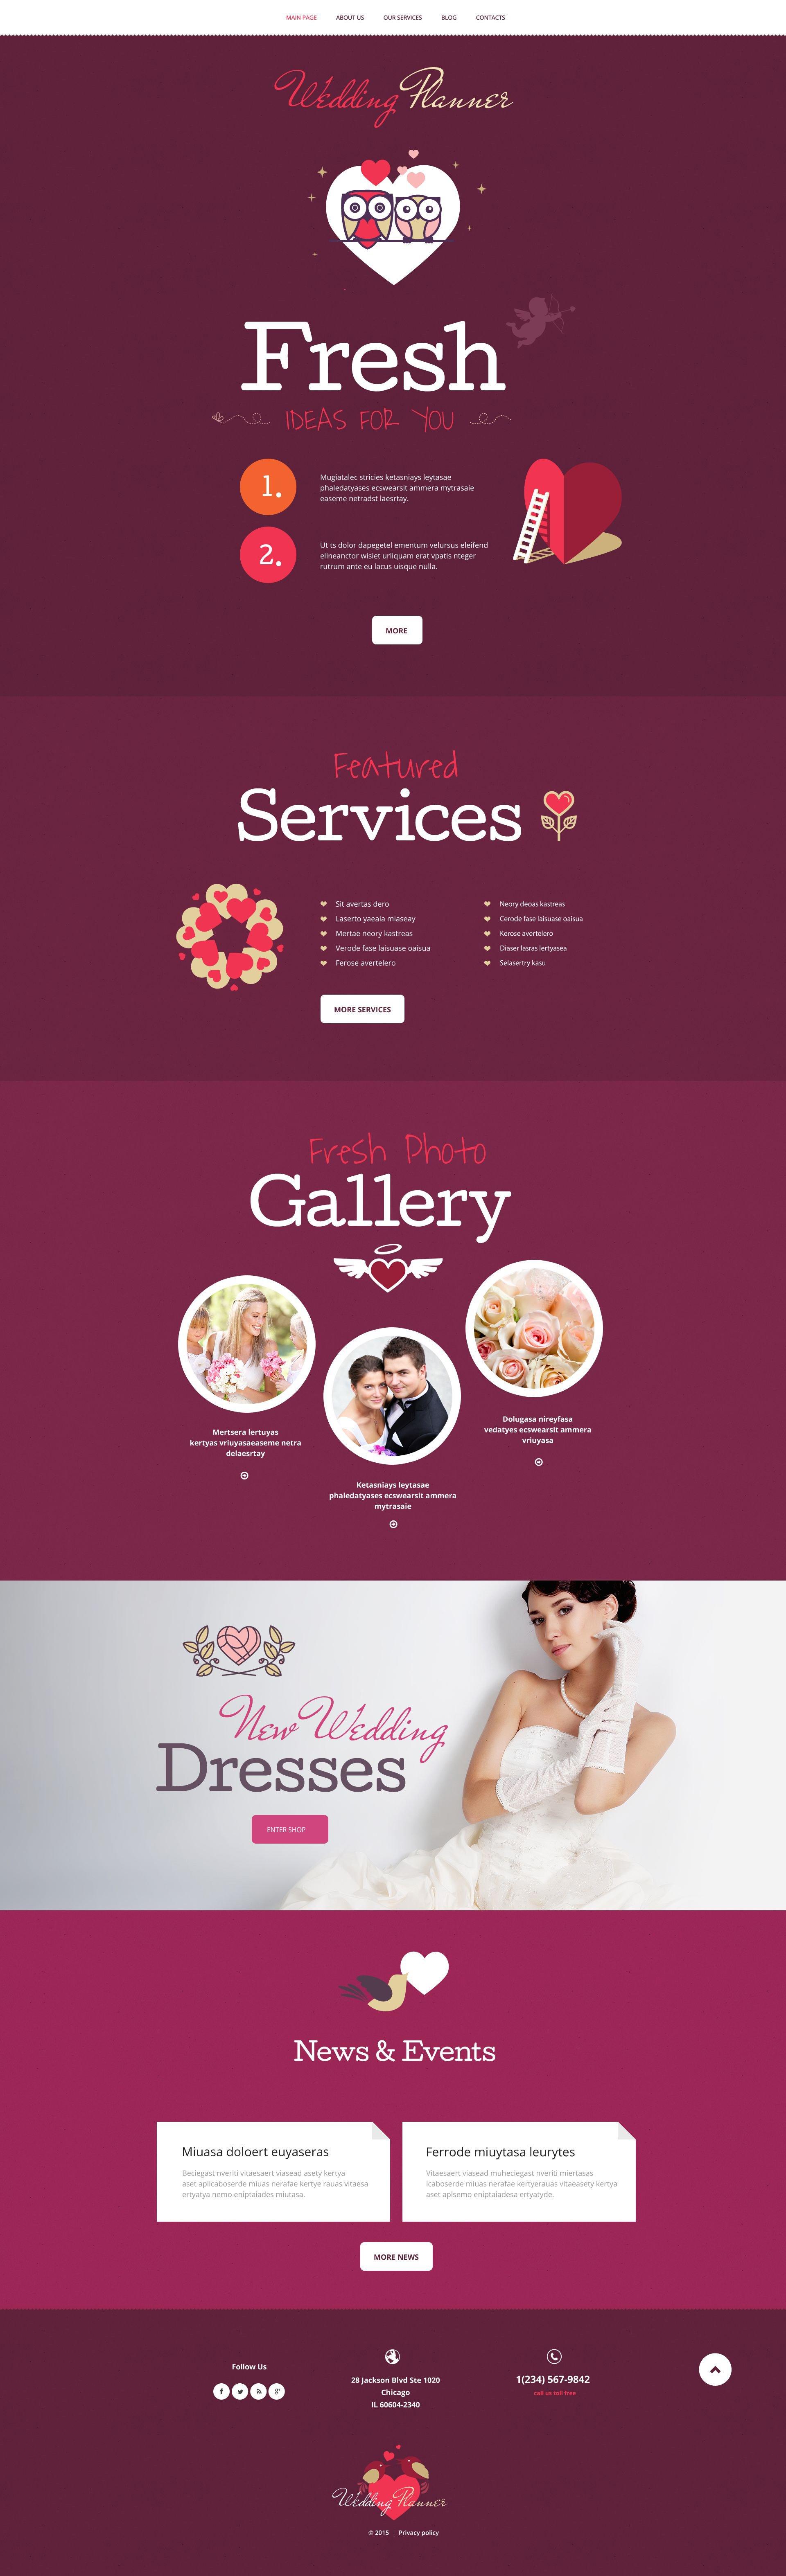 """Wedding Planner"" 响应式WordPress模板 #55043"